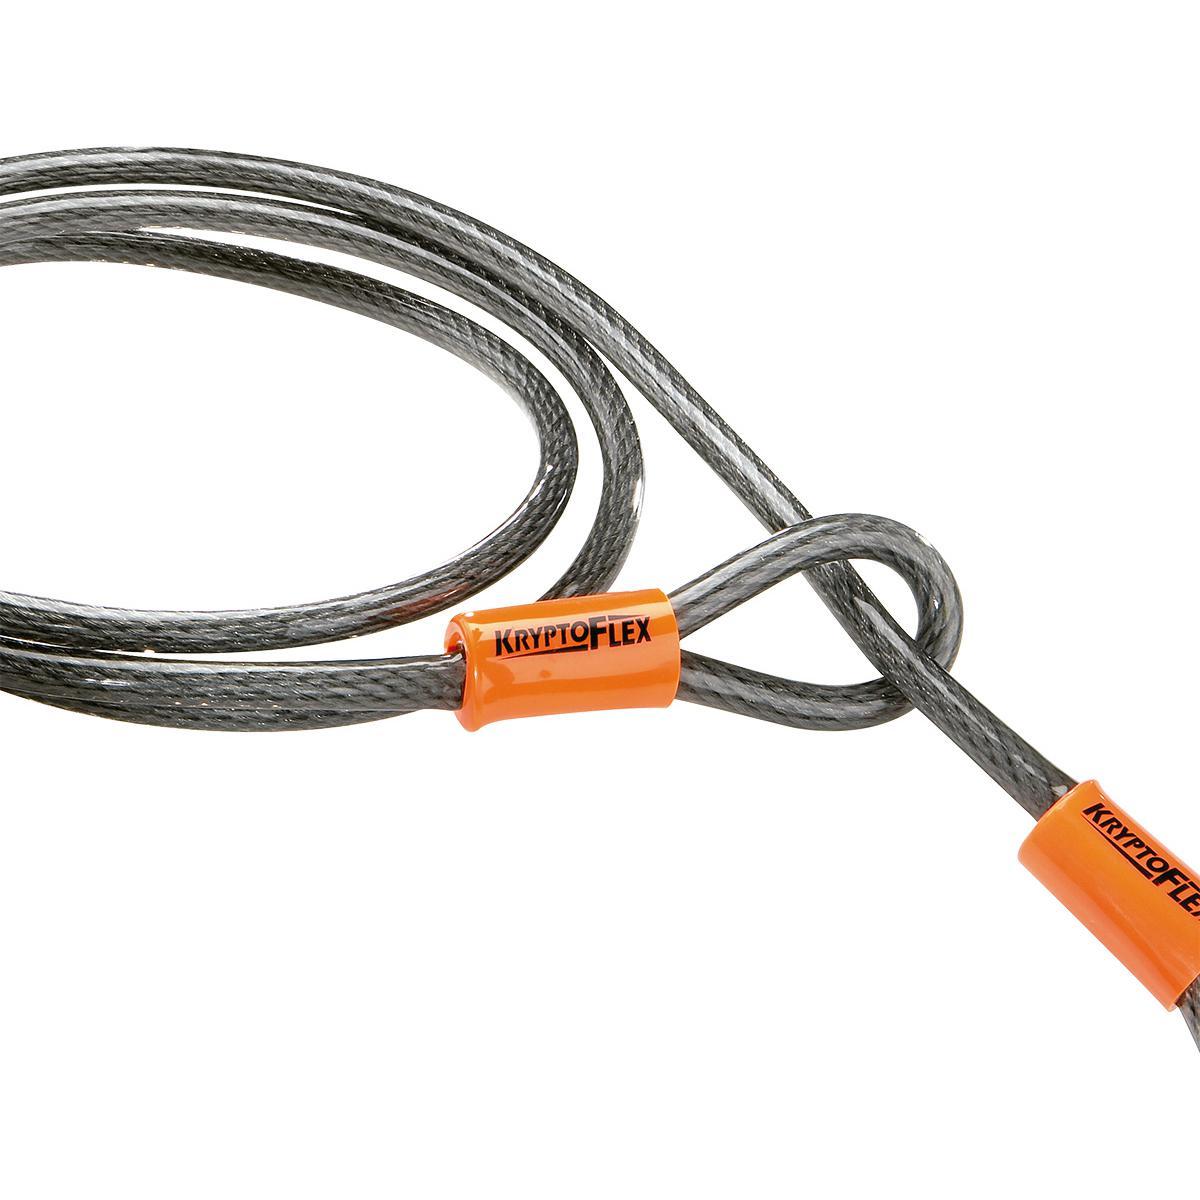 KRYPTOFLEX 710 LOOPED CABLE (10x2130)